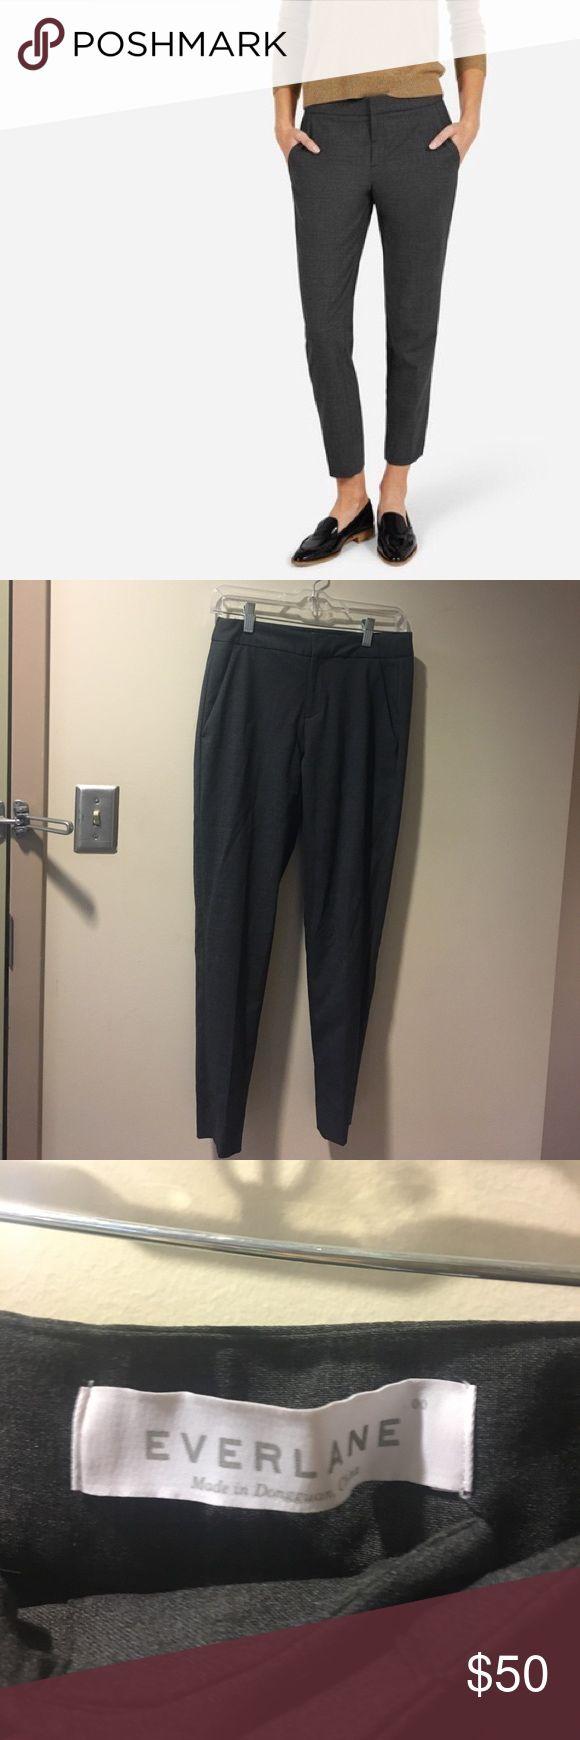 Everlane Women's Slim Trouser Brand new never worn. Everlane Pants Trousers